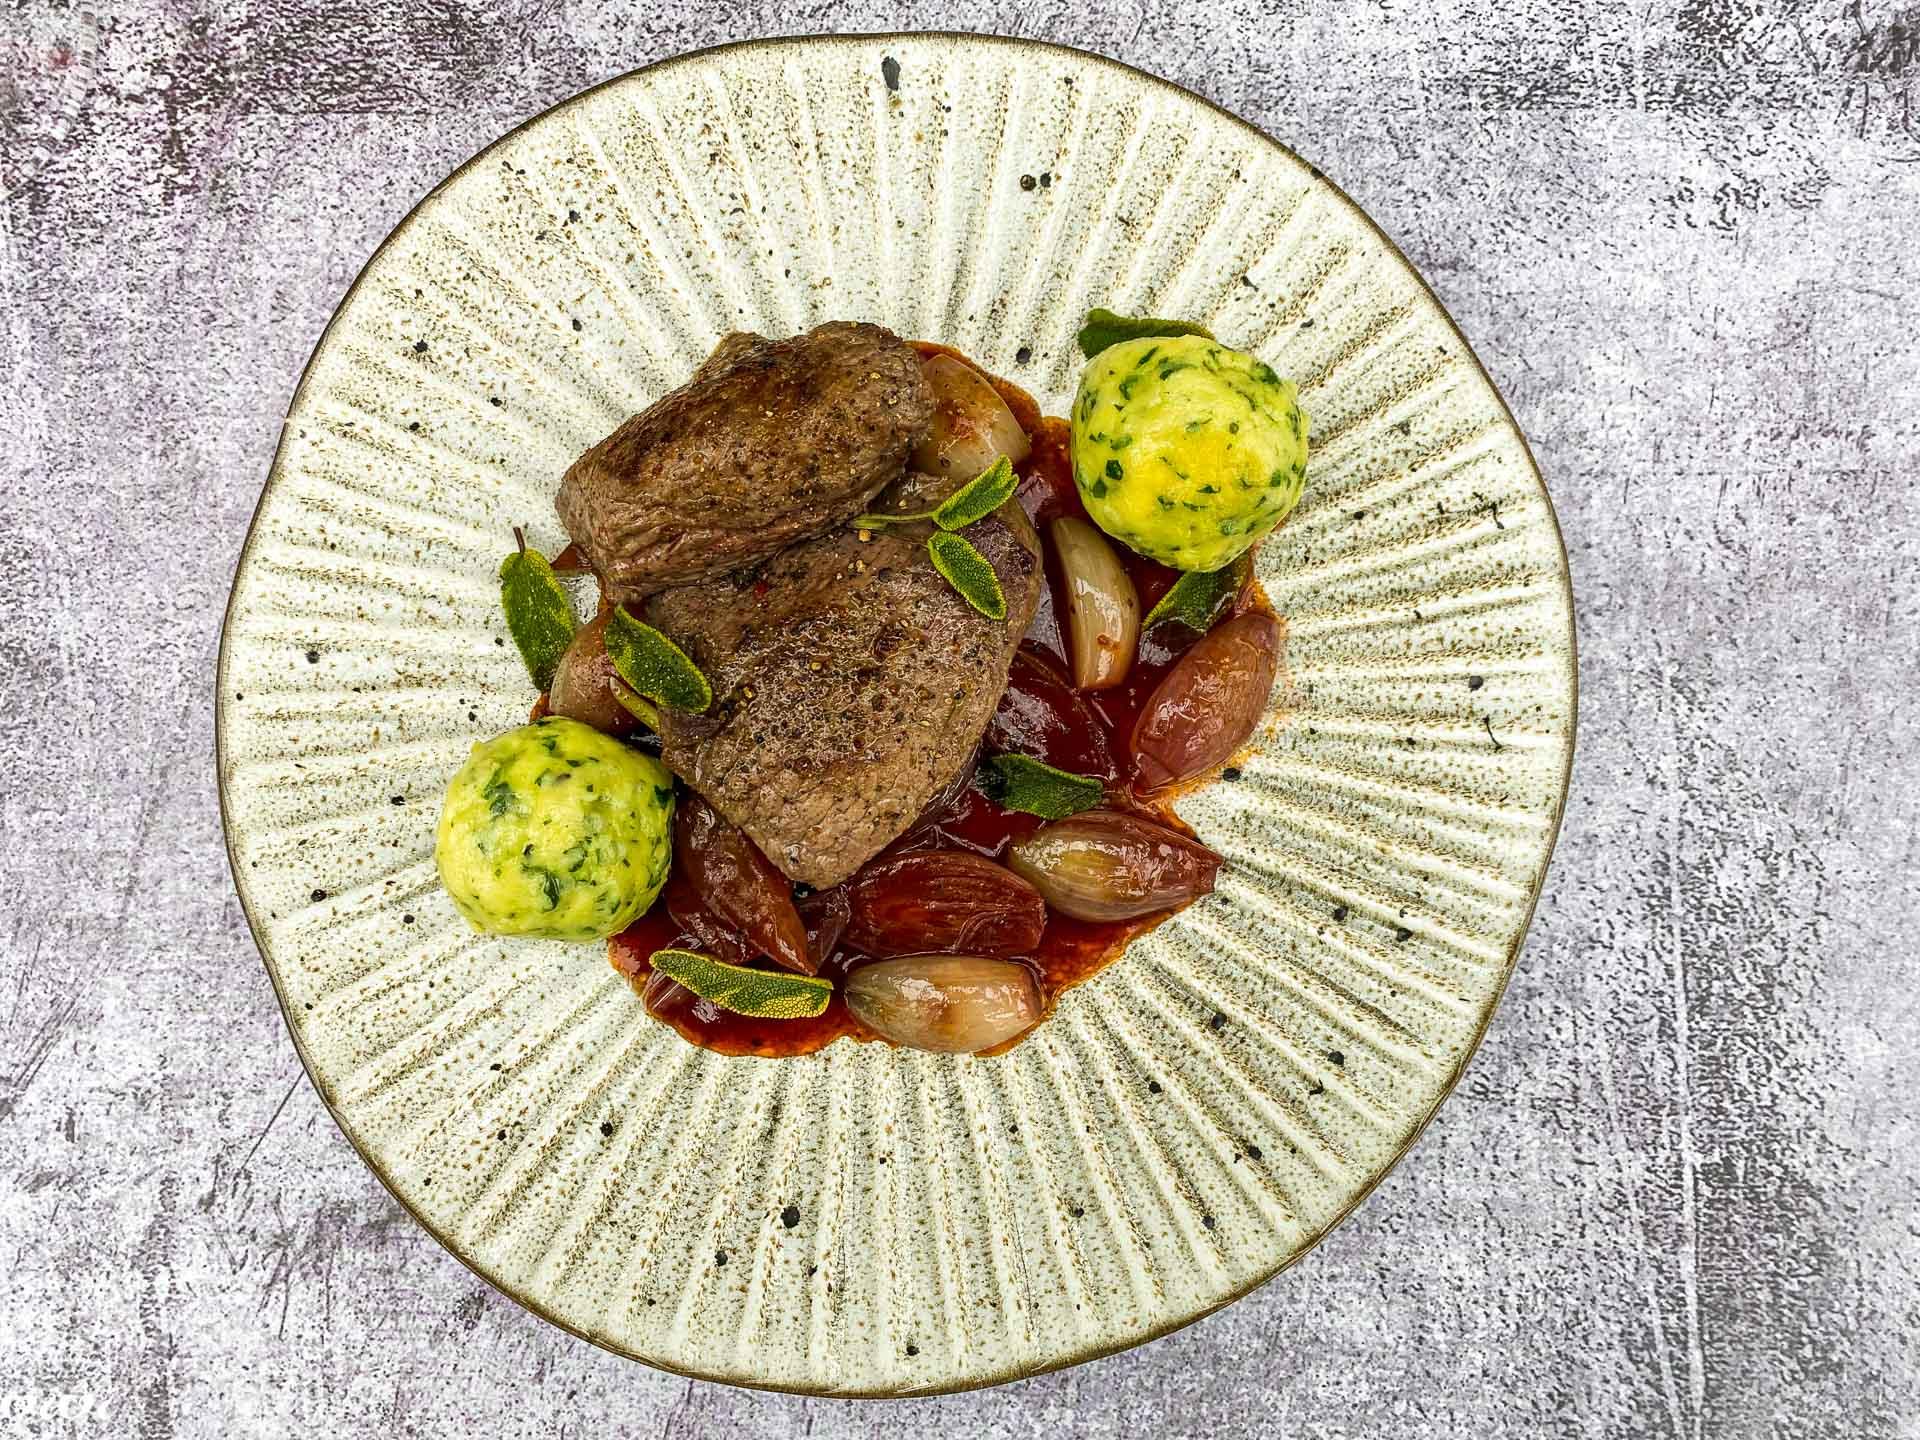 divjačinski steak s šalotkino vinsko omako047